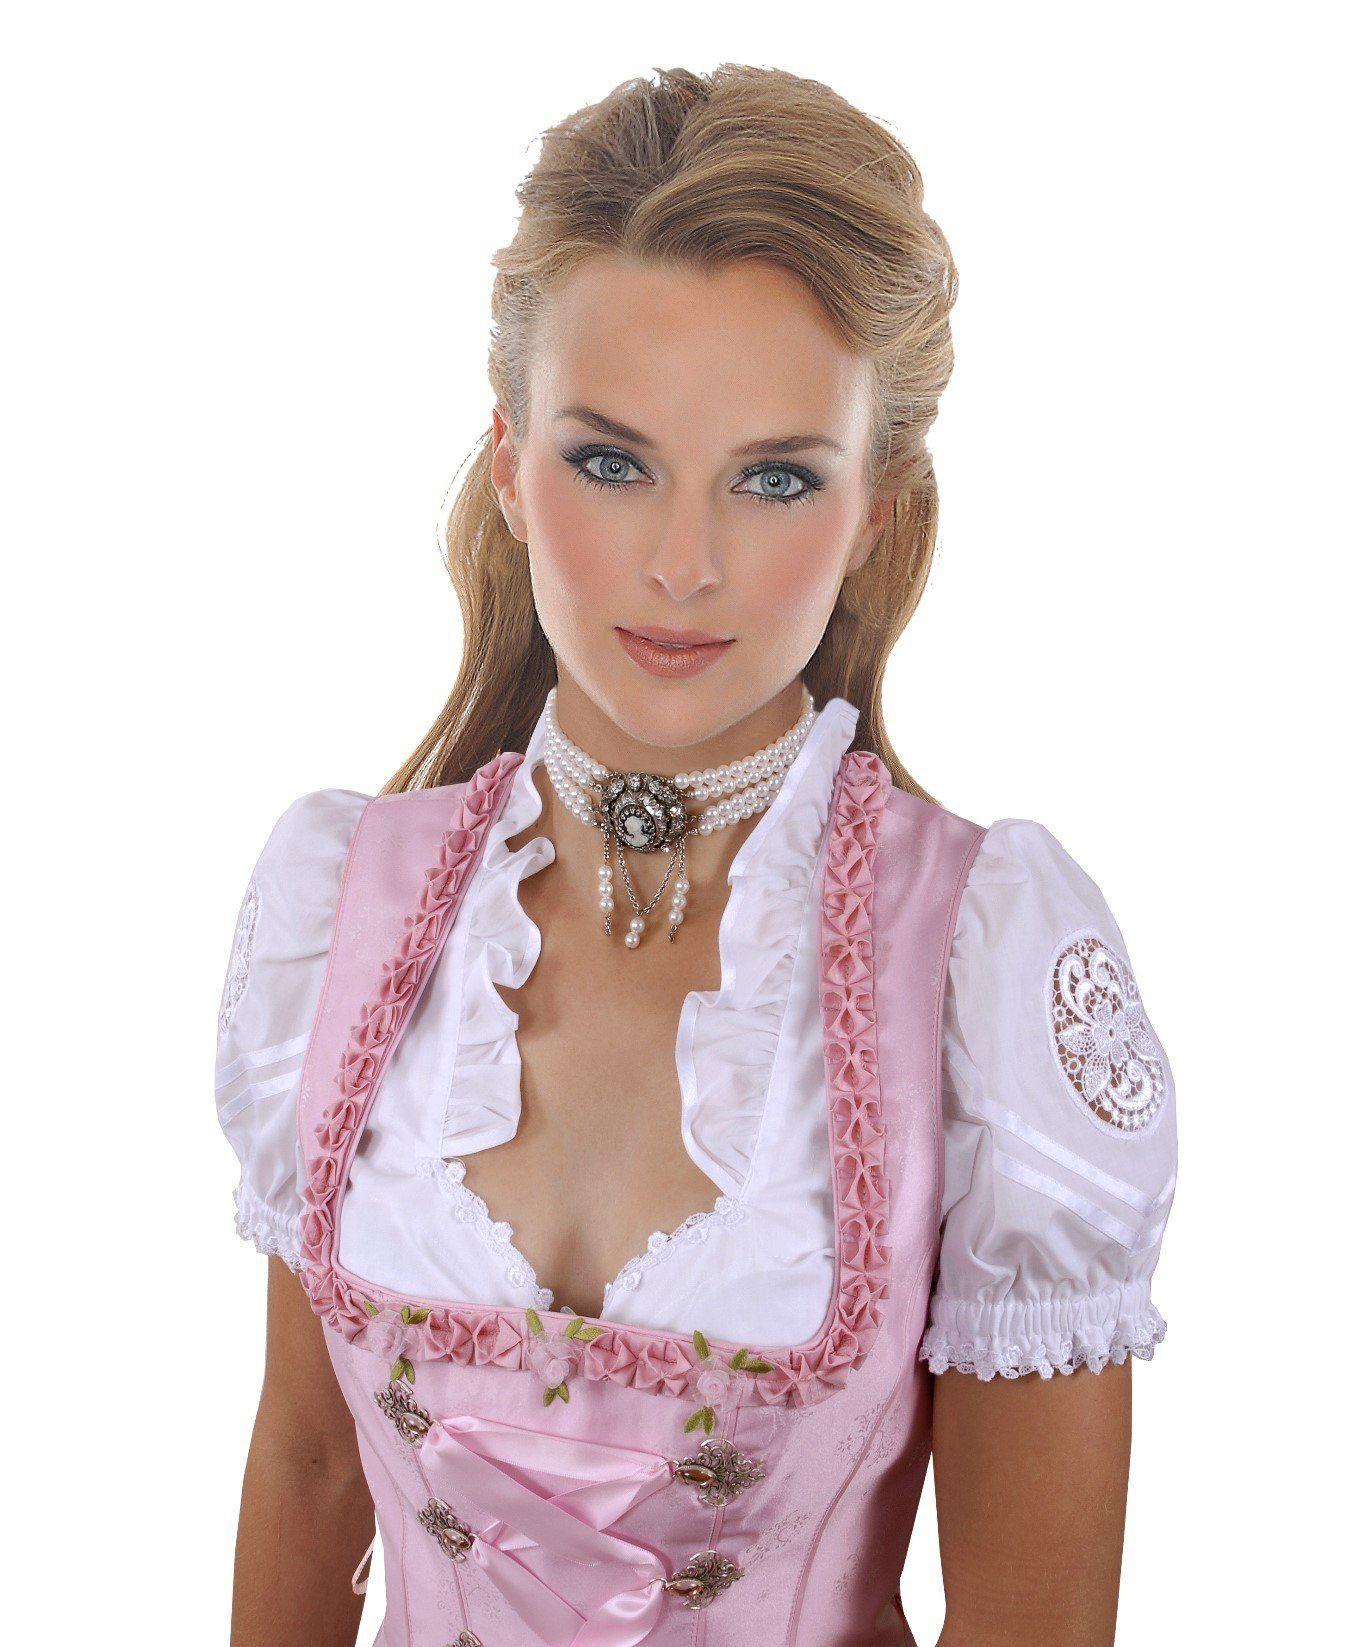 Noble Dirndl blouse with lace medallion - Top Quality: Amazon.de: Clothing